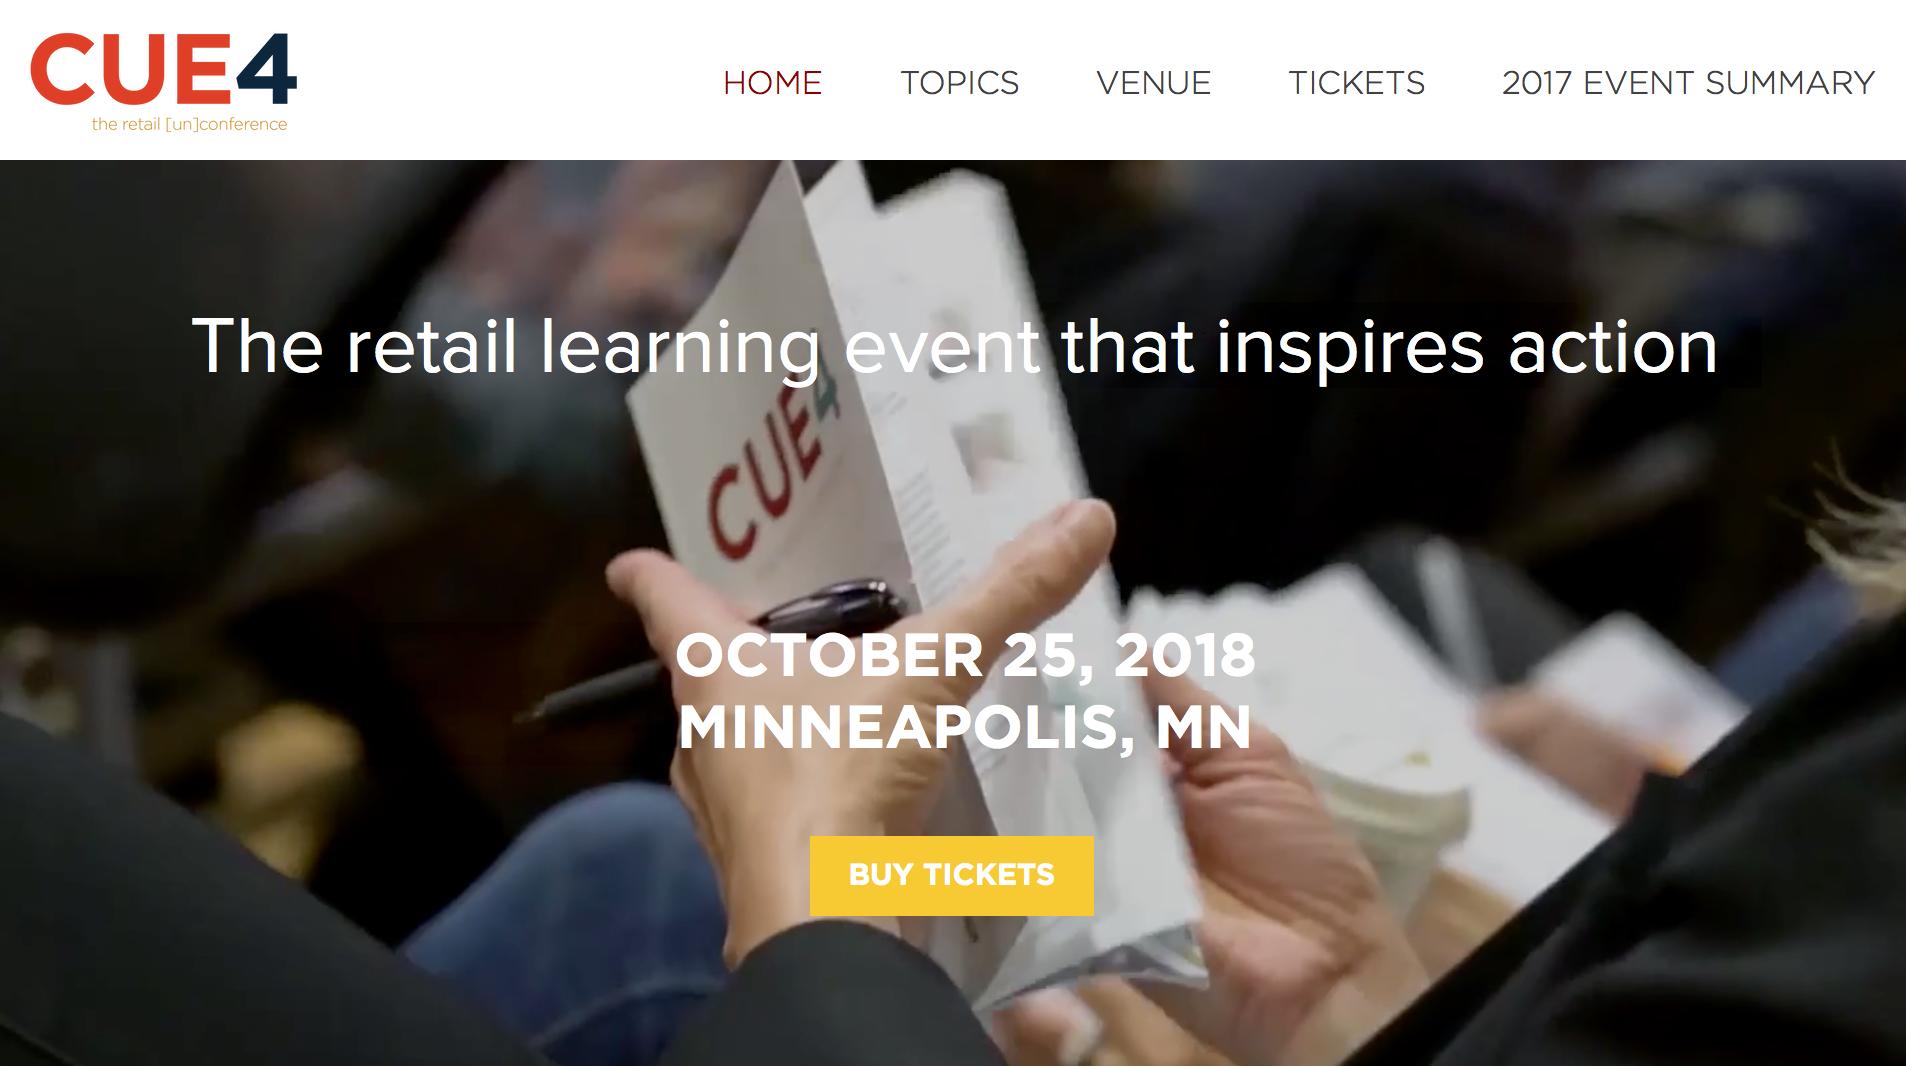 CUE4 The Retail [un]Conference